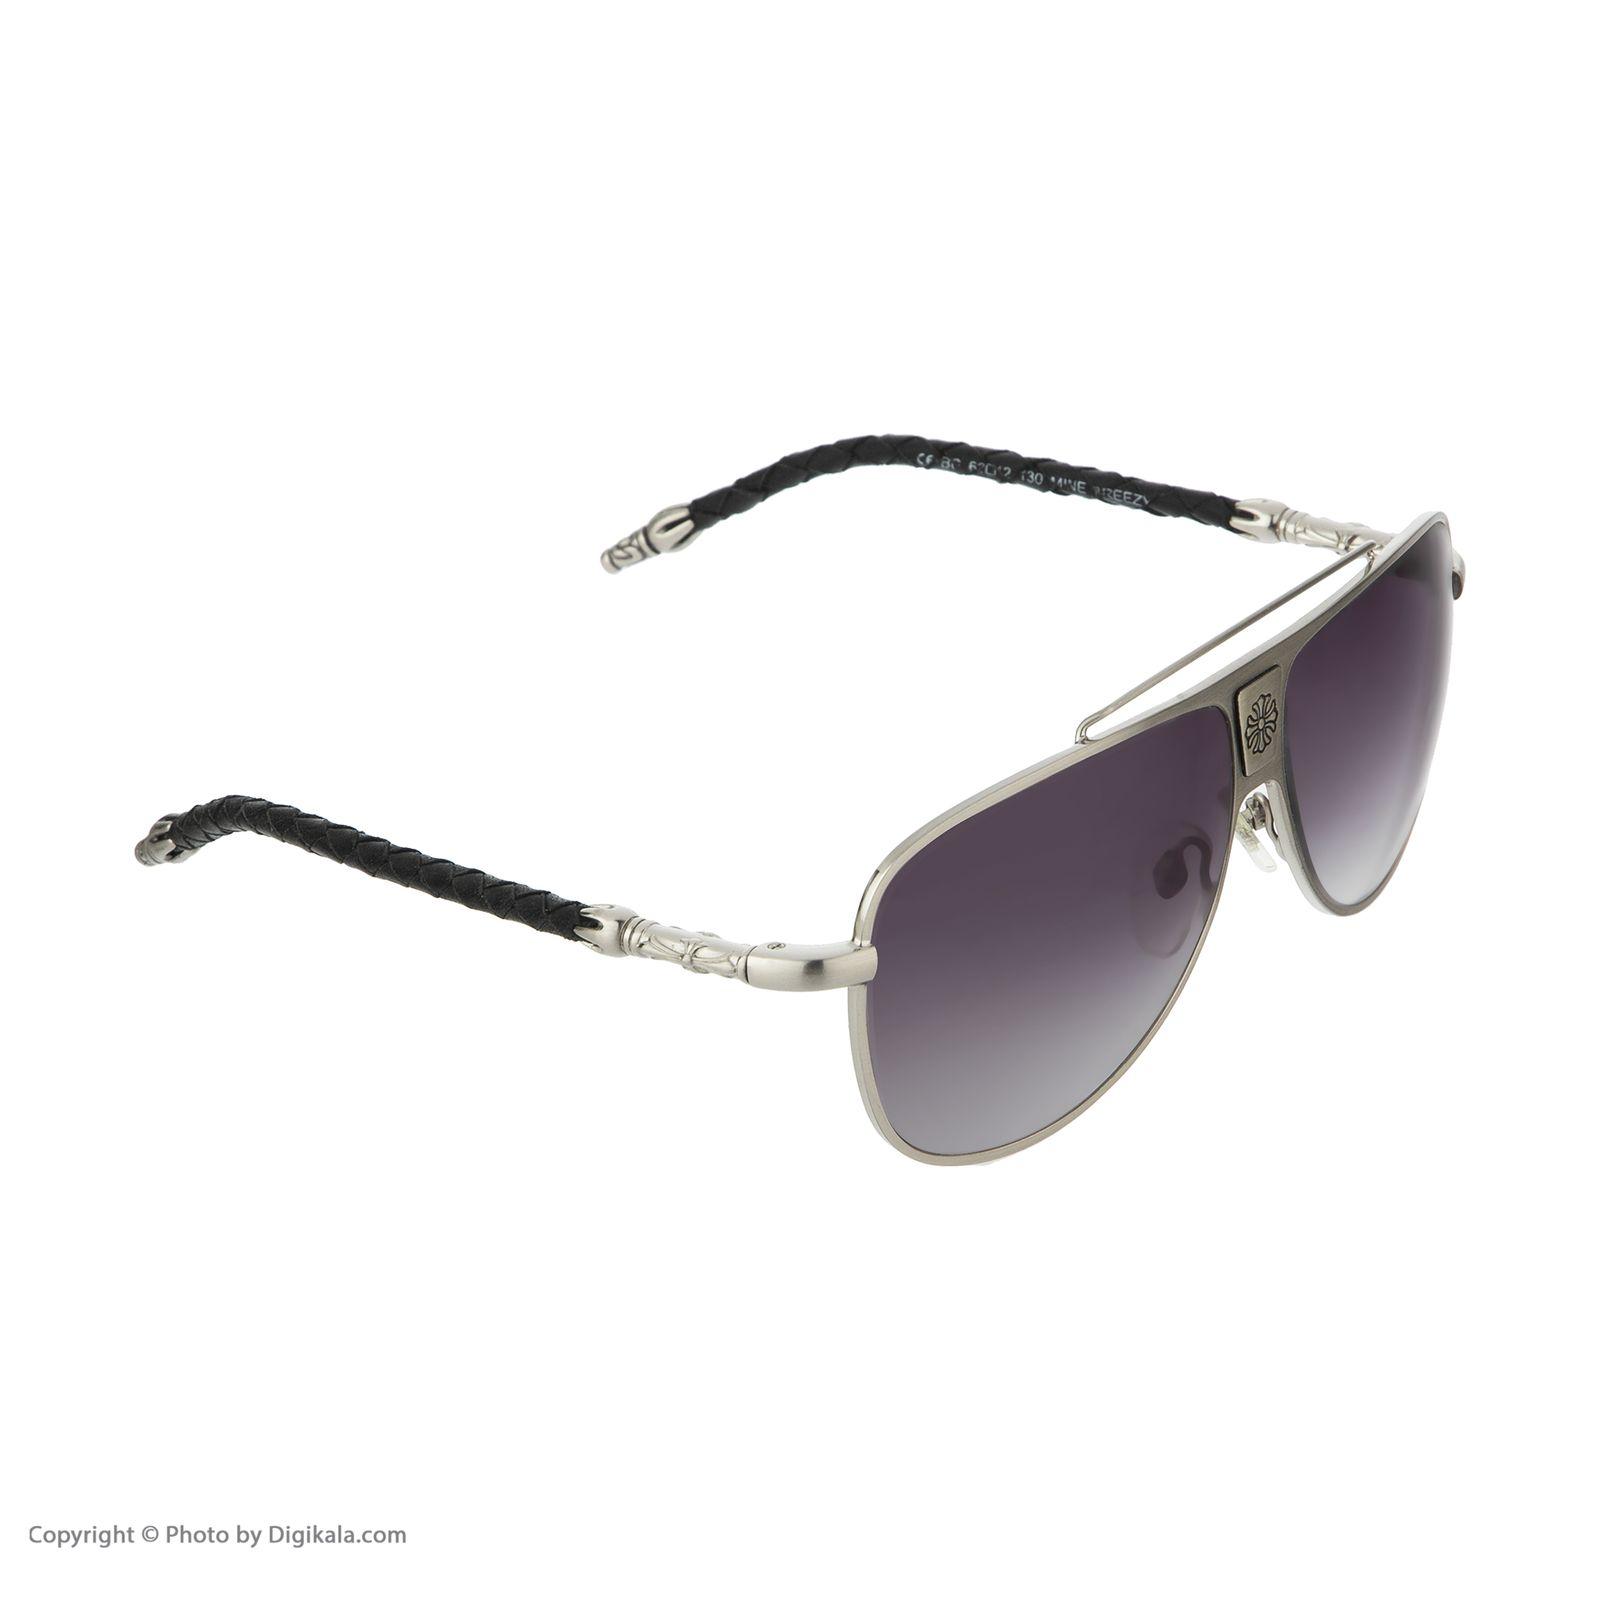 عینک آفتابی کروم هارتز مدل mine -  - 2